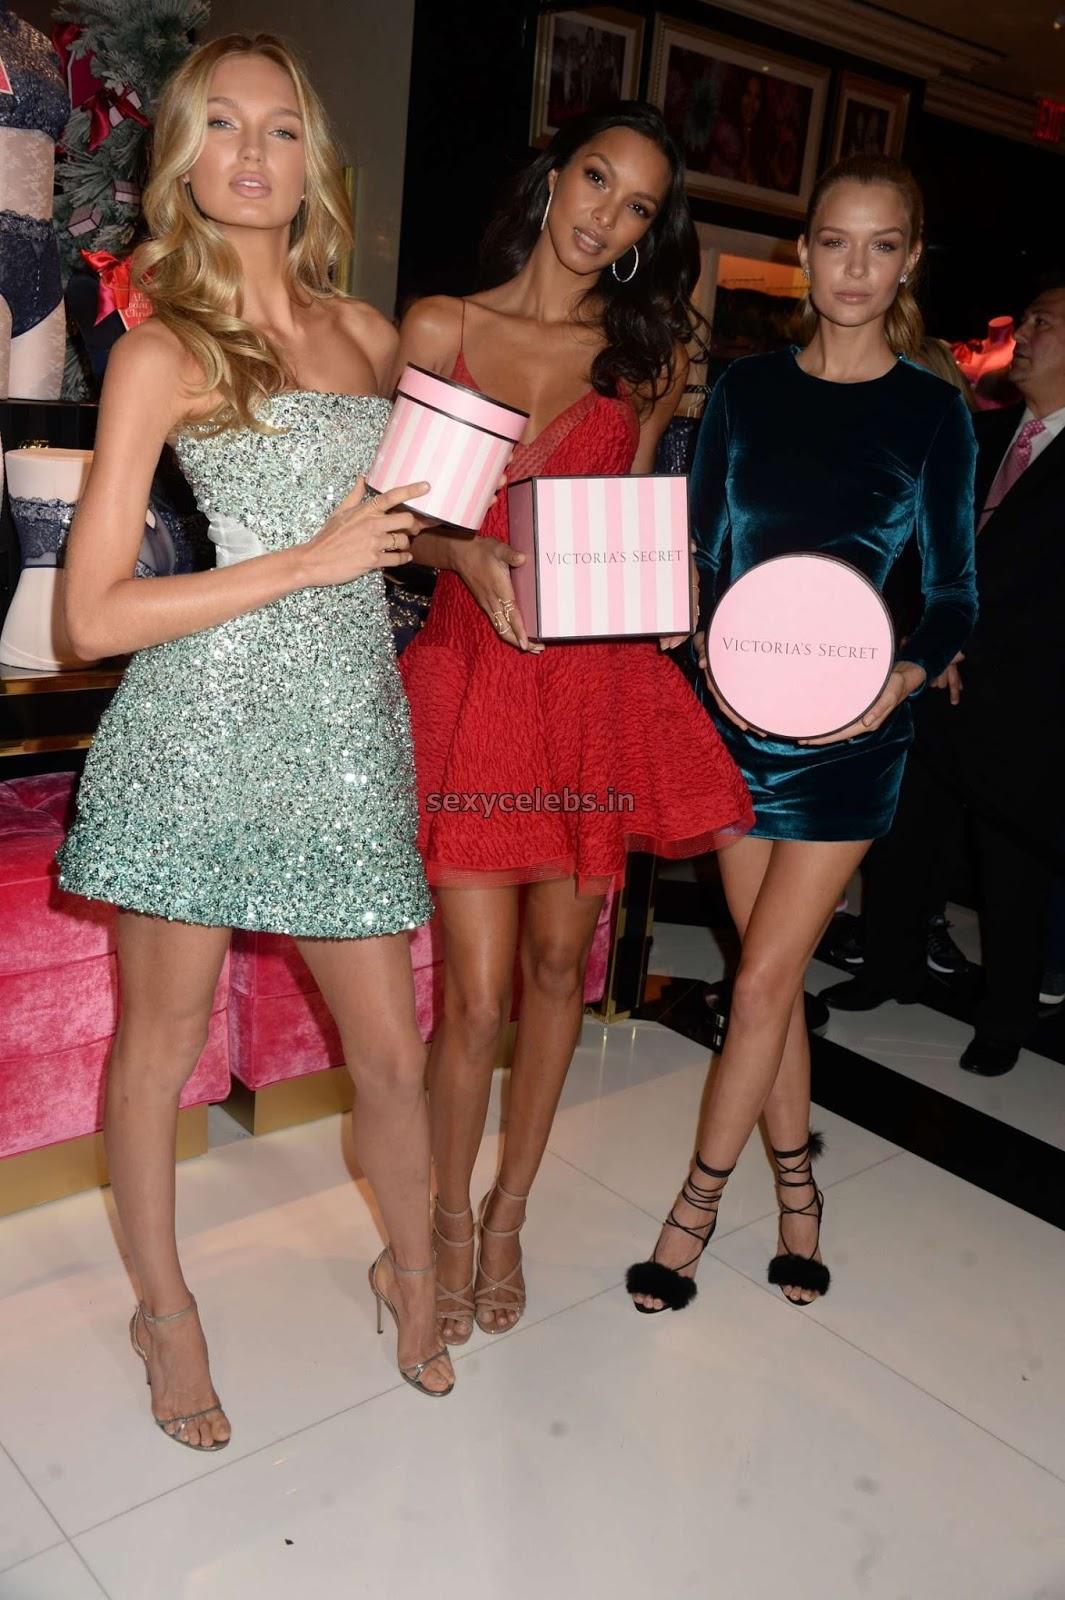 Lais Ribeiro in red Hot Lignerie for Victorias Secret Fashion Show Celebration Nov 2016 WOW Hot Boobs